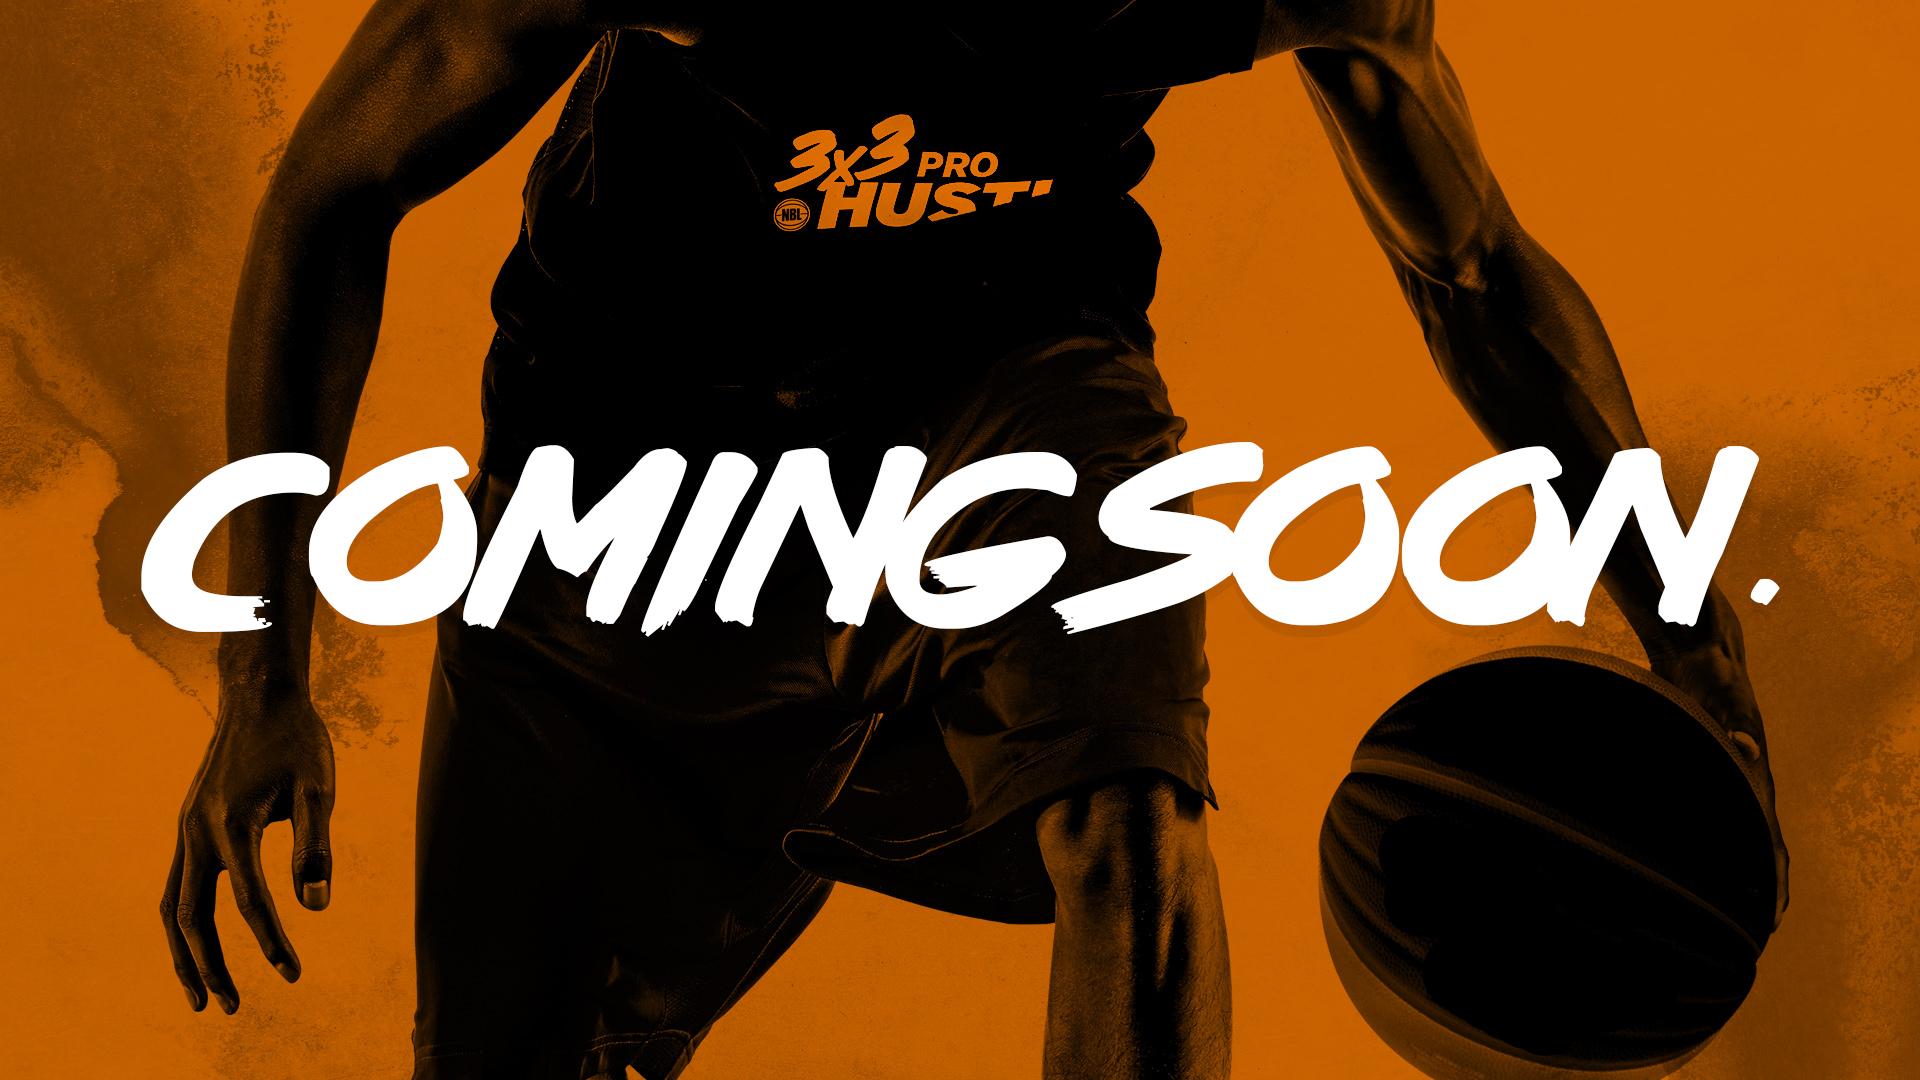 2019 NBL 3×3 Pro Hustle Announced